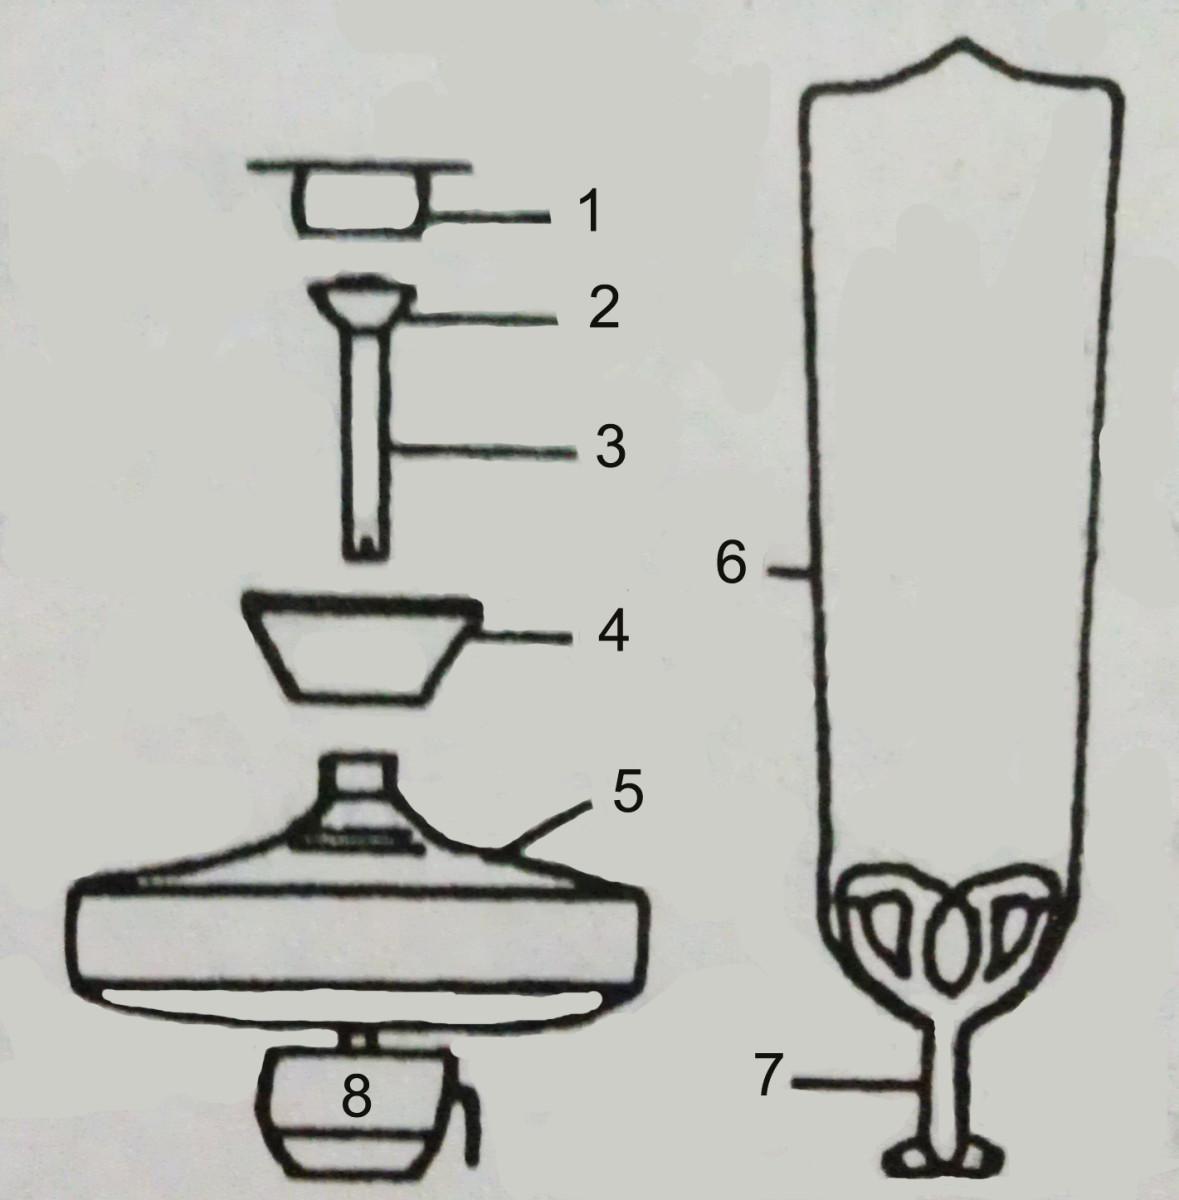 Australia As Well Ceiling Fan Light Fixture Wiring besides Honda Crx Engine besides 89 Honda Accord Fuel Pump Location likewise 1990 Acura Integra Engine Head as well Toyota Mr2 Harness Bar. on 1989 honda crx wiring diagram